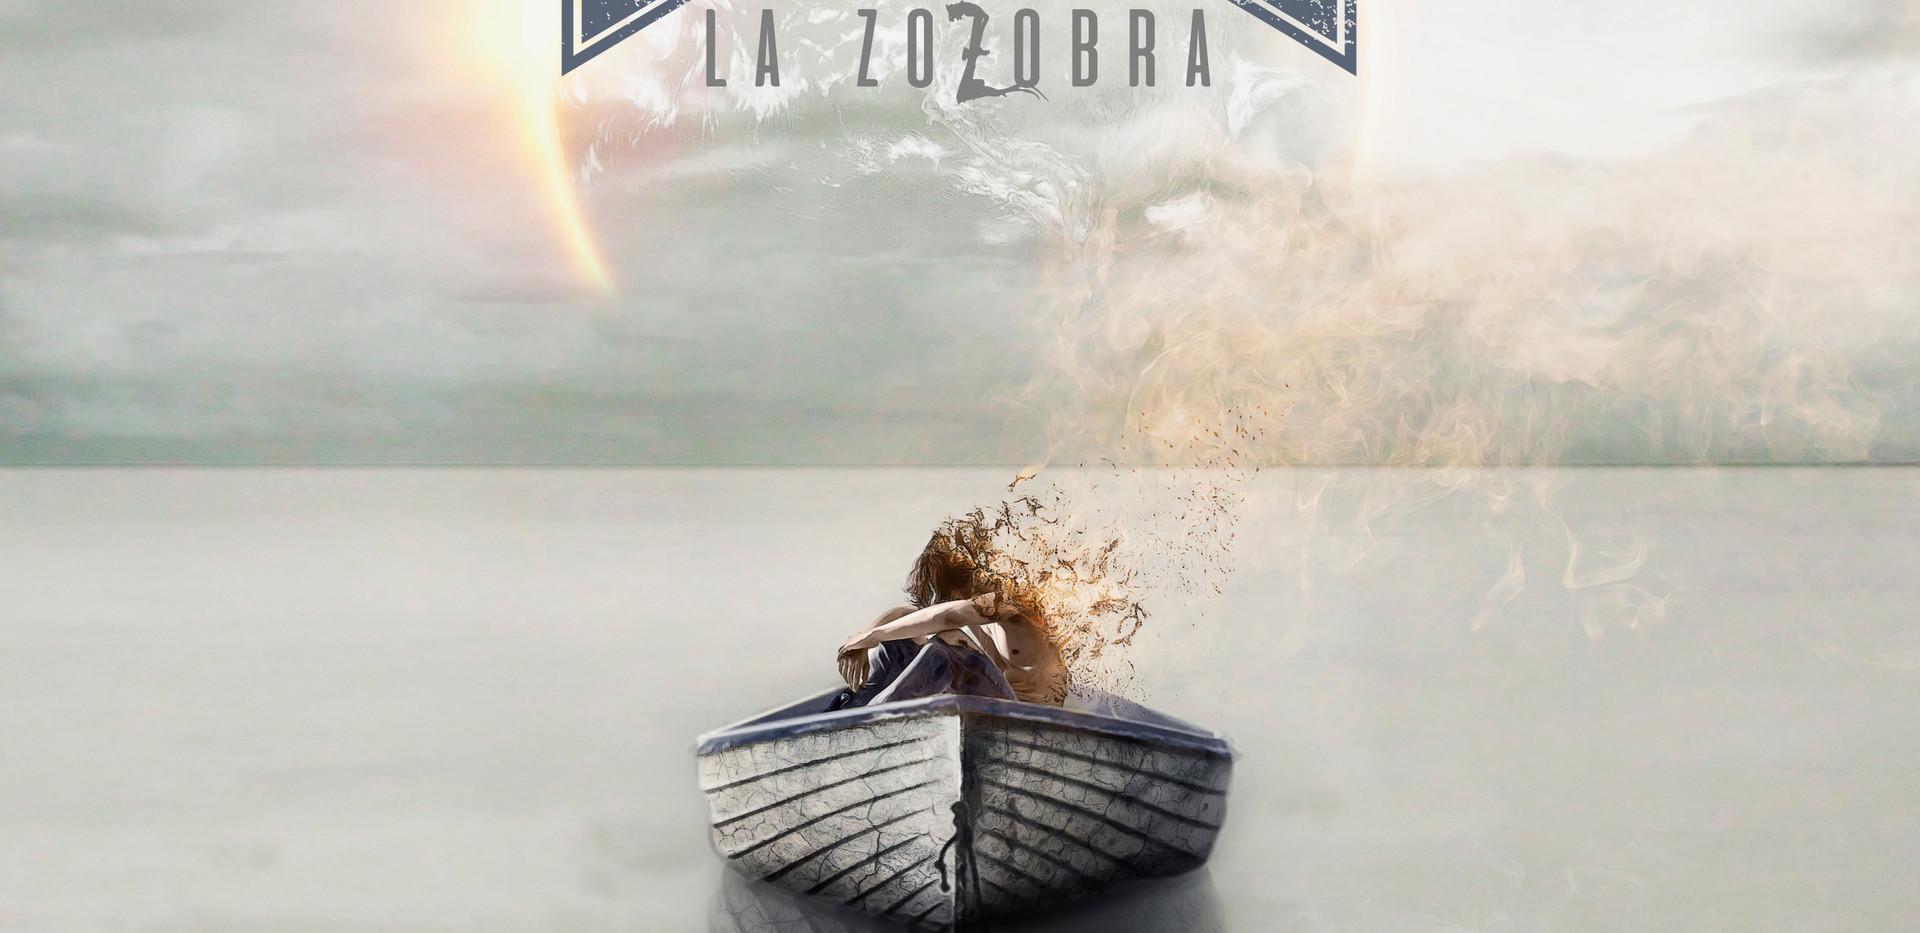 CANO LA ZOZOBRA 01b 2.jpg